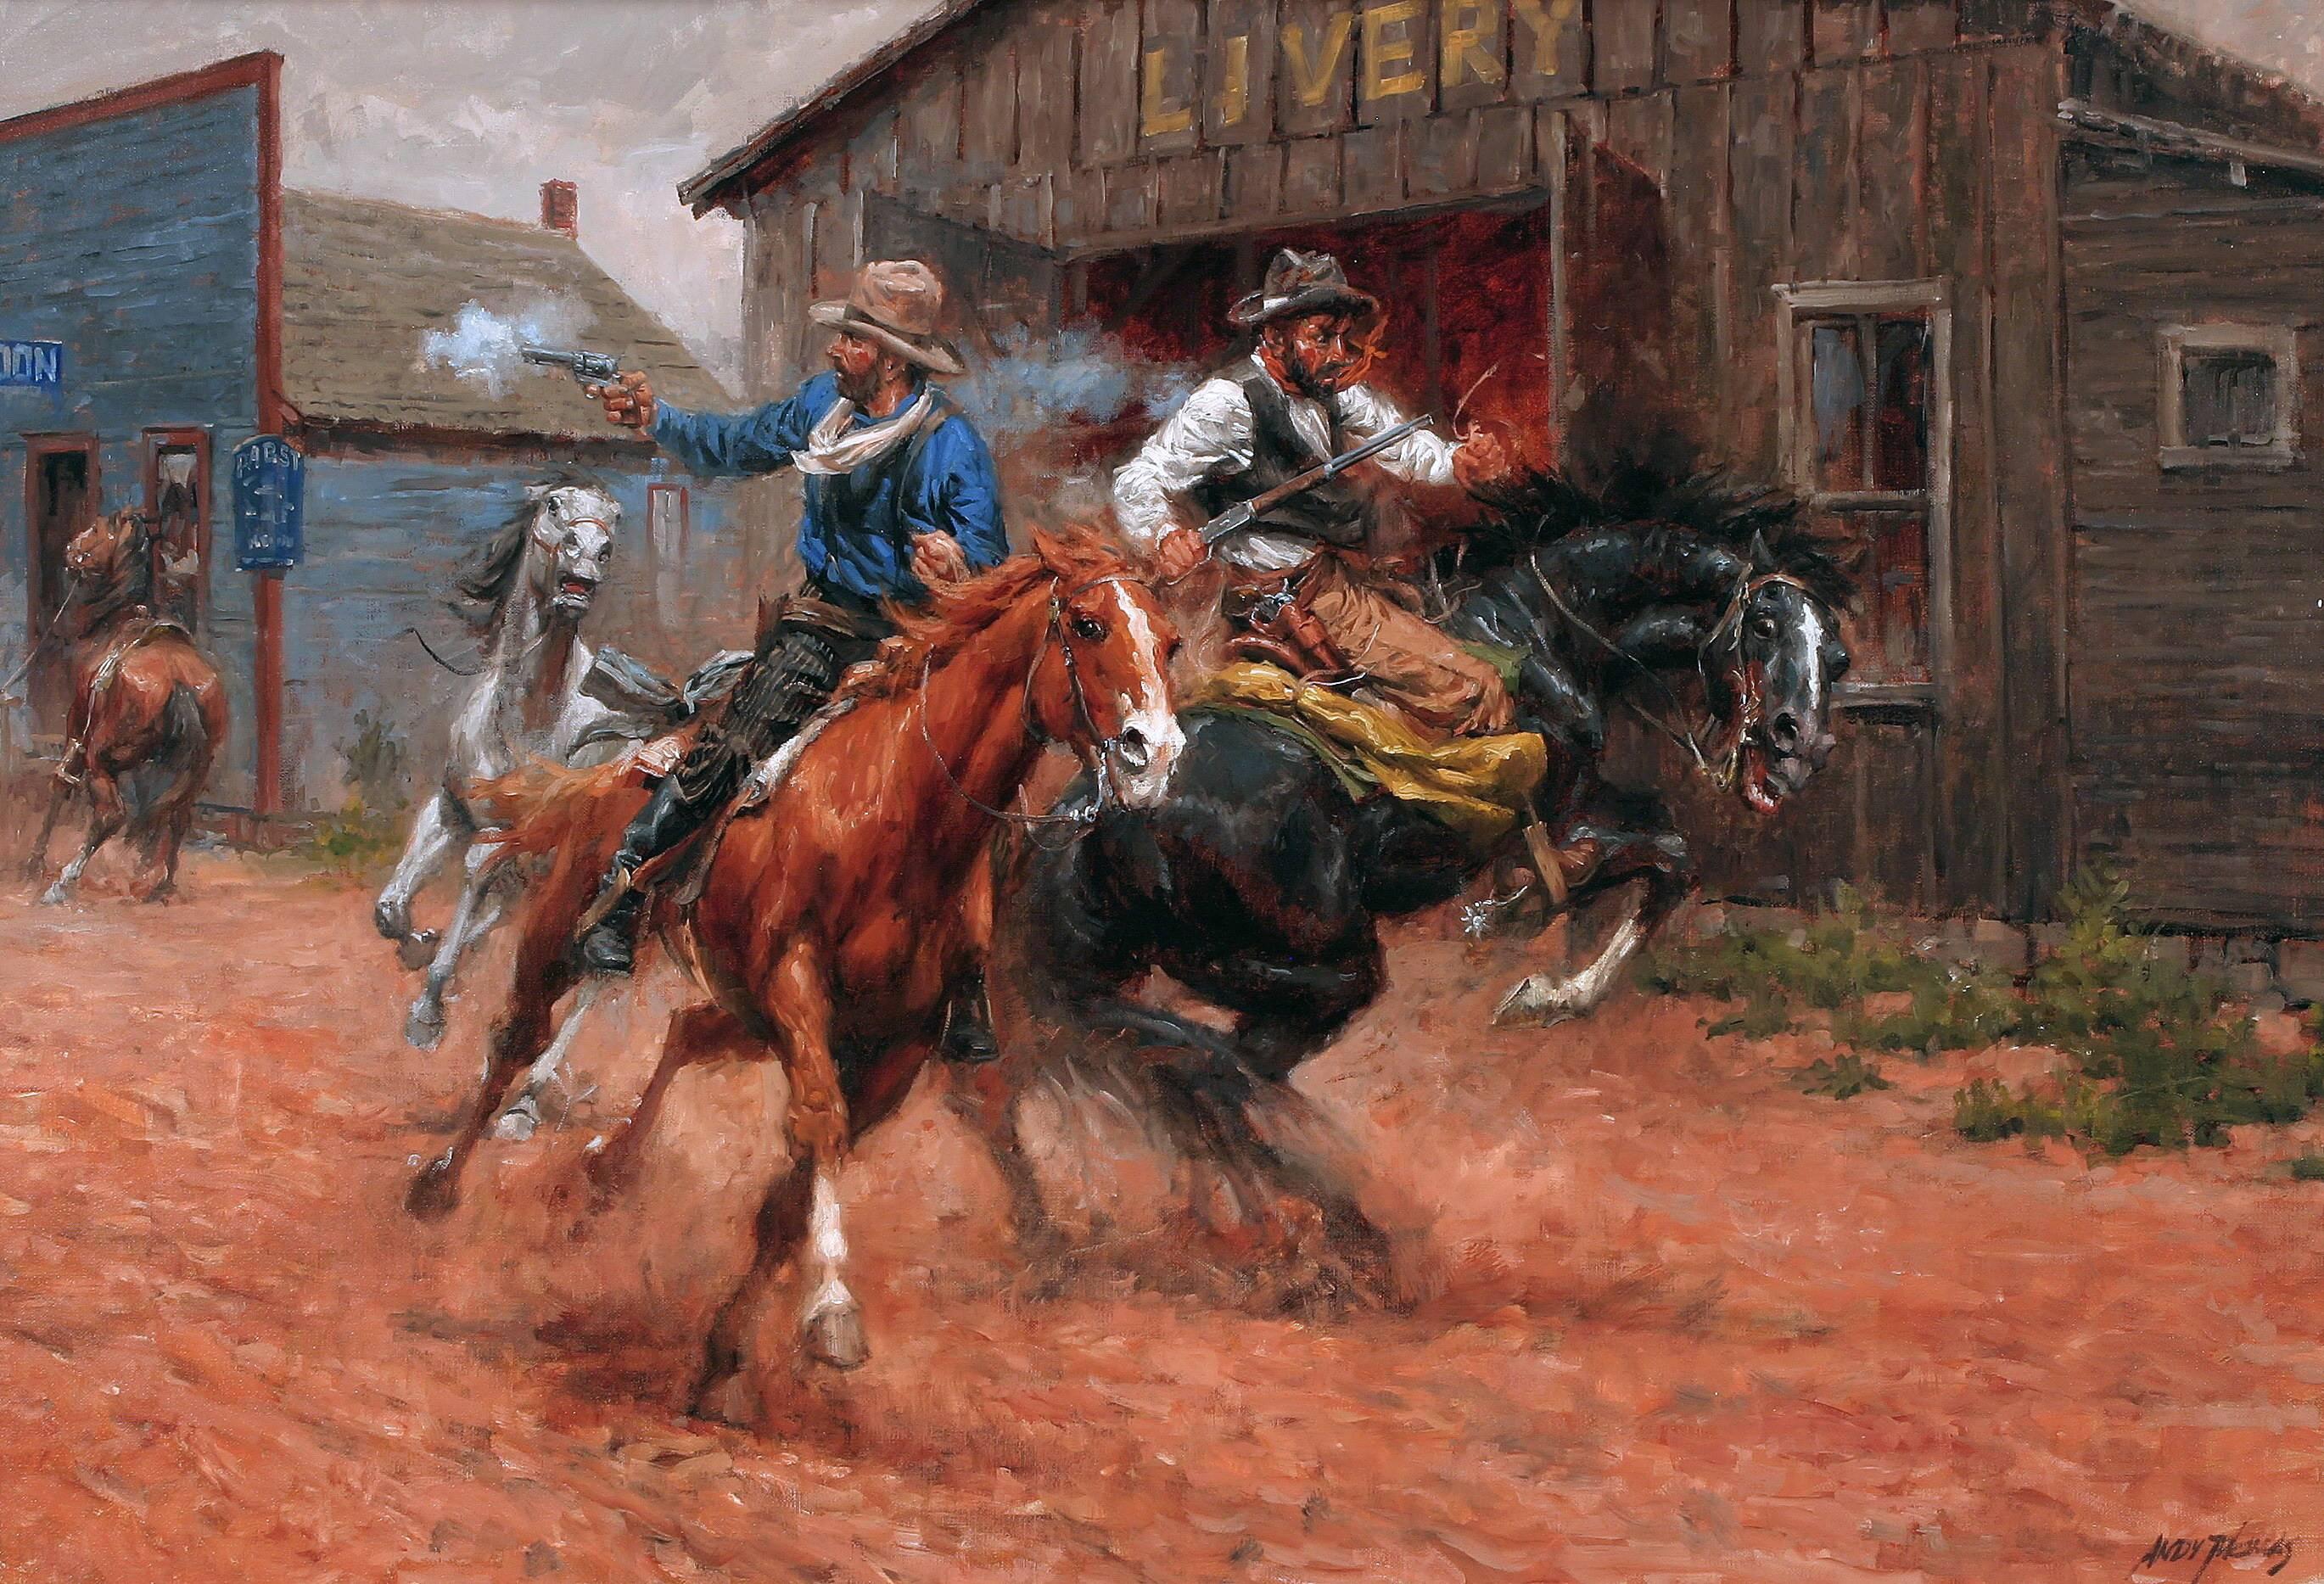 Western Art Wallpapers Top Free Western Art Backgrounds Wallpaperaccess